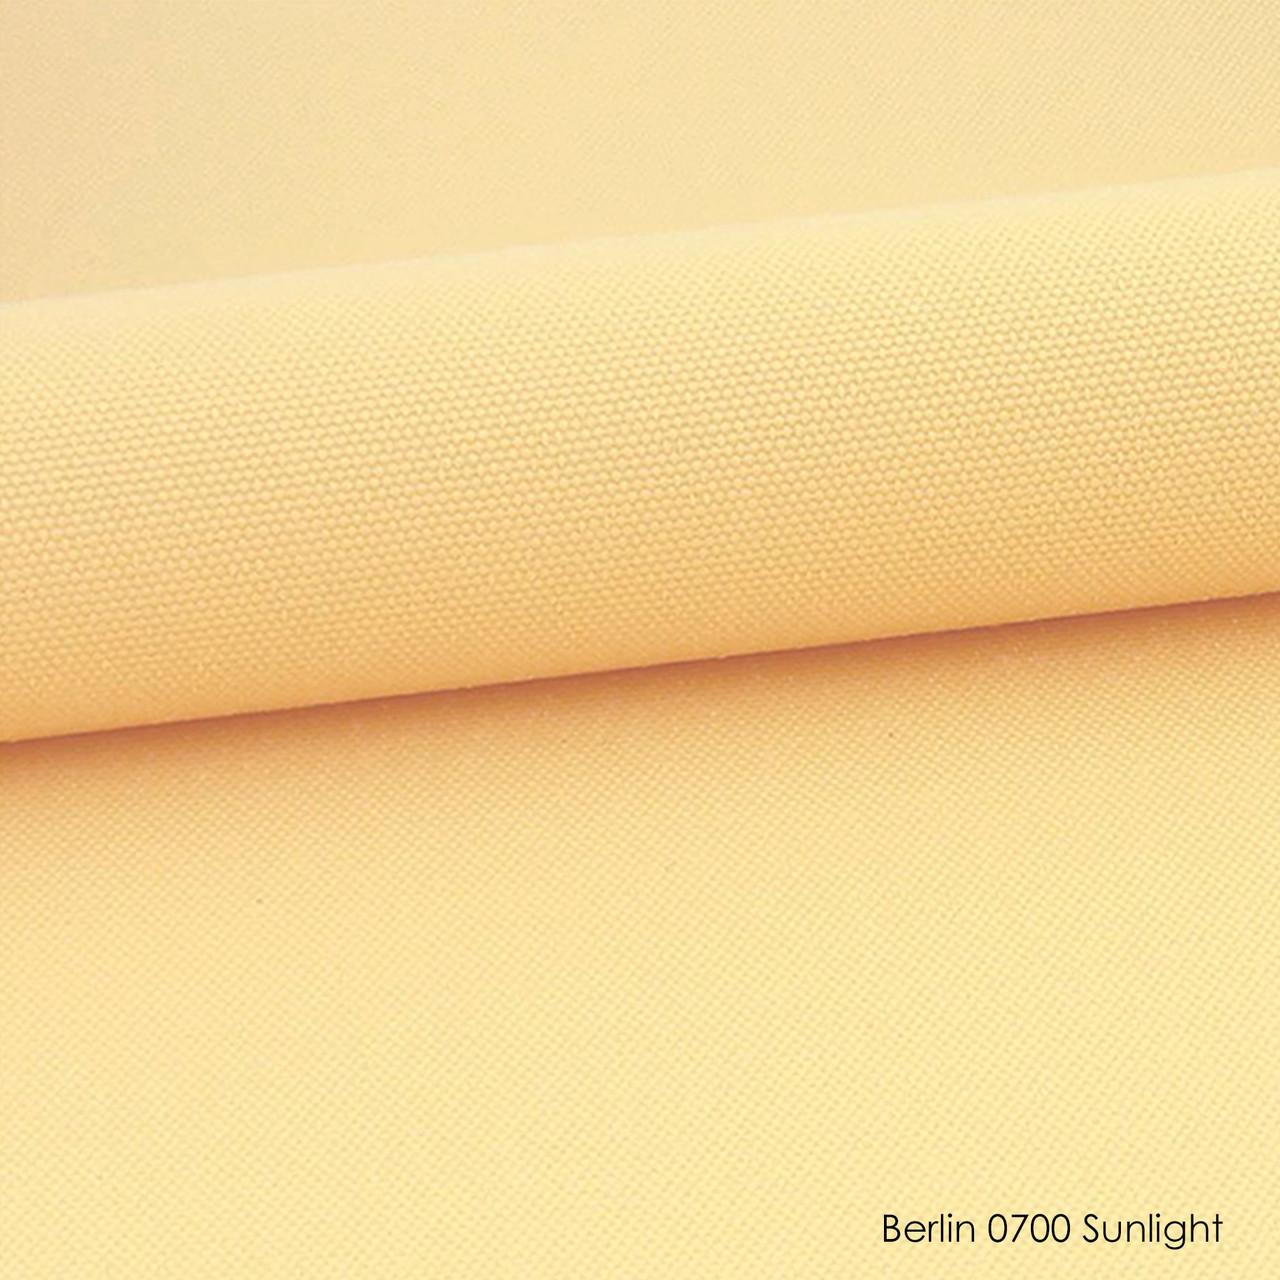 Ролети тканинні Berlin 0700 sunlight